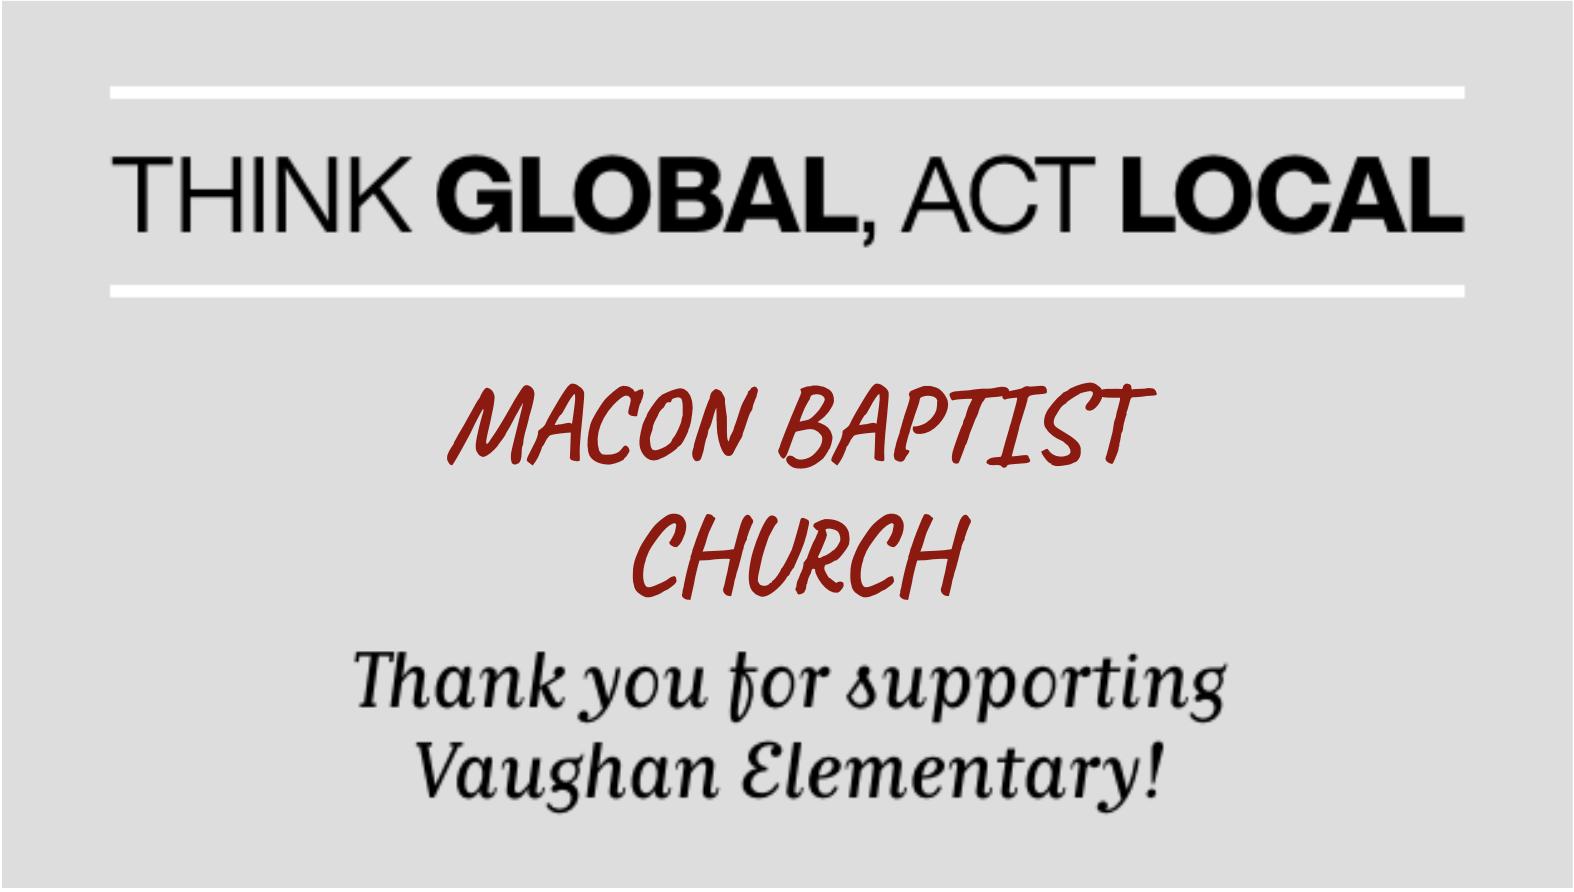 MACON BAPTIST CHURCH